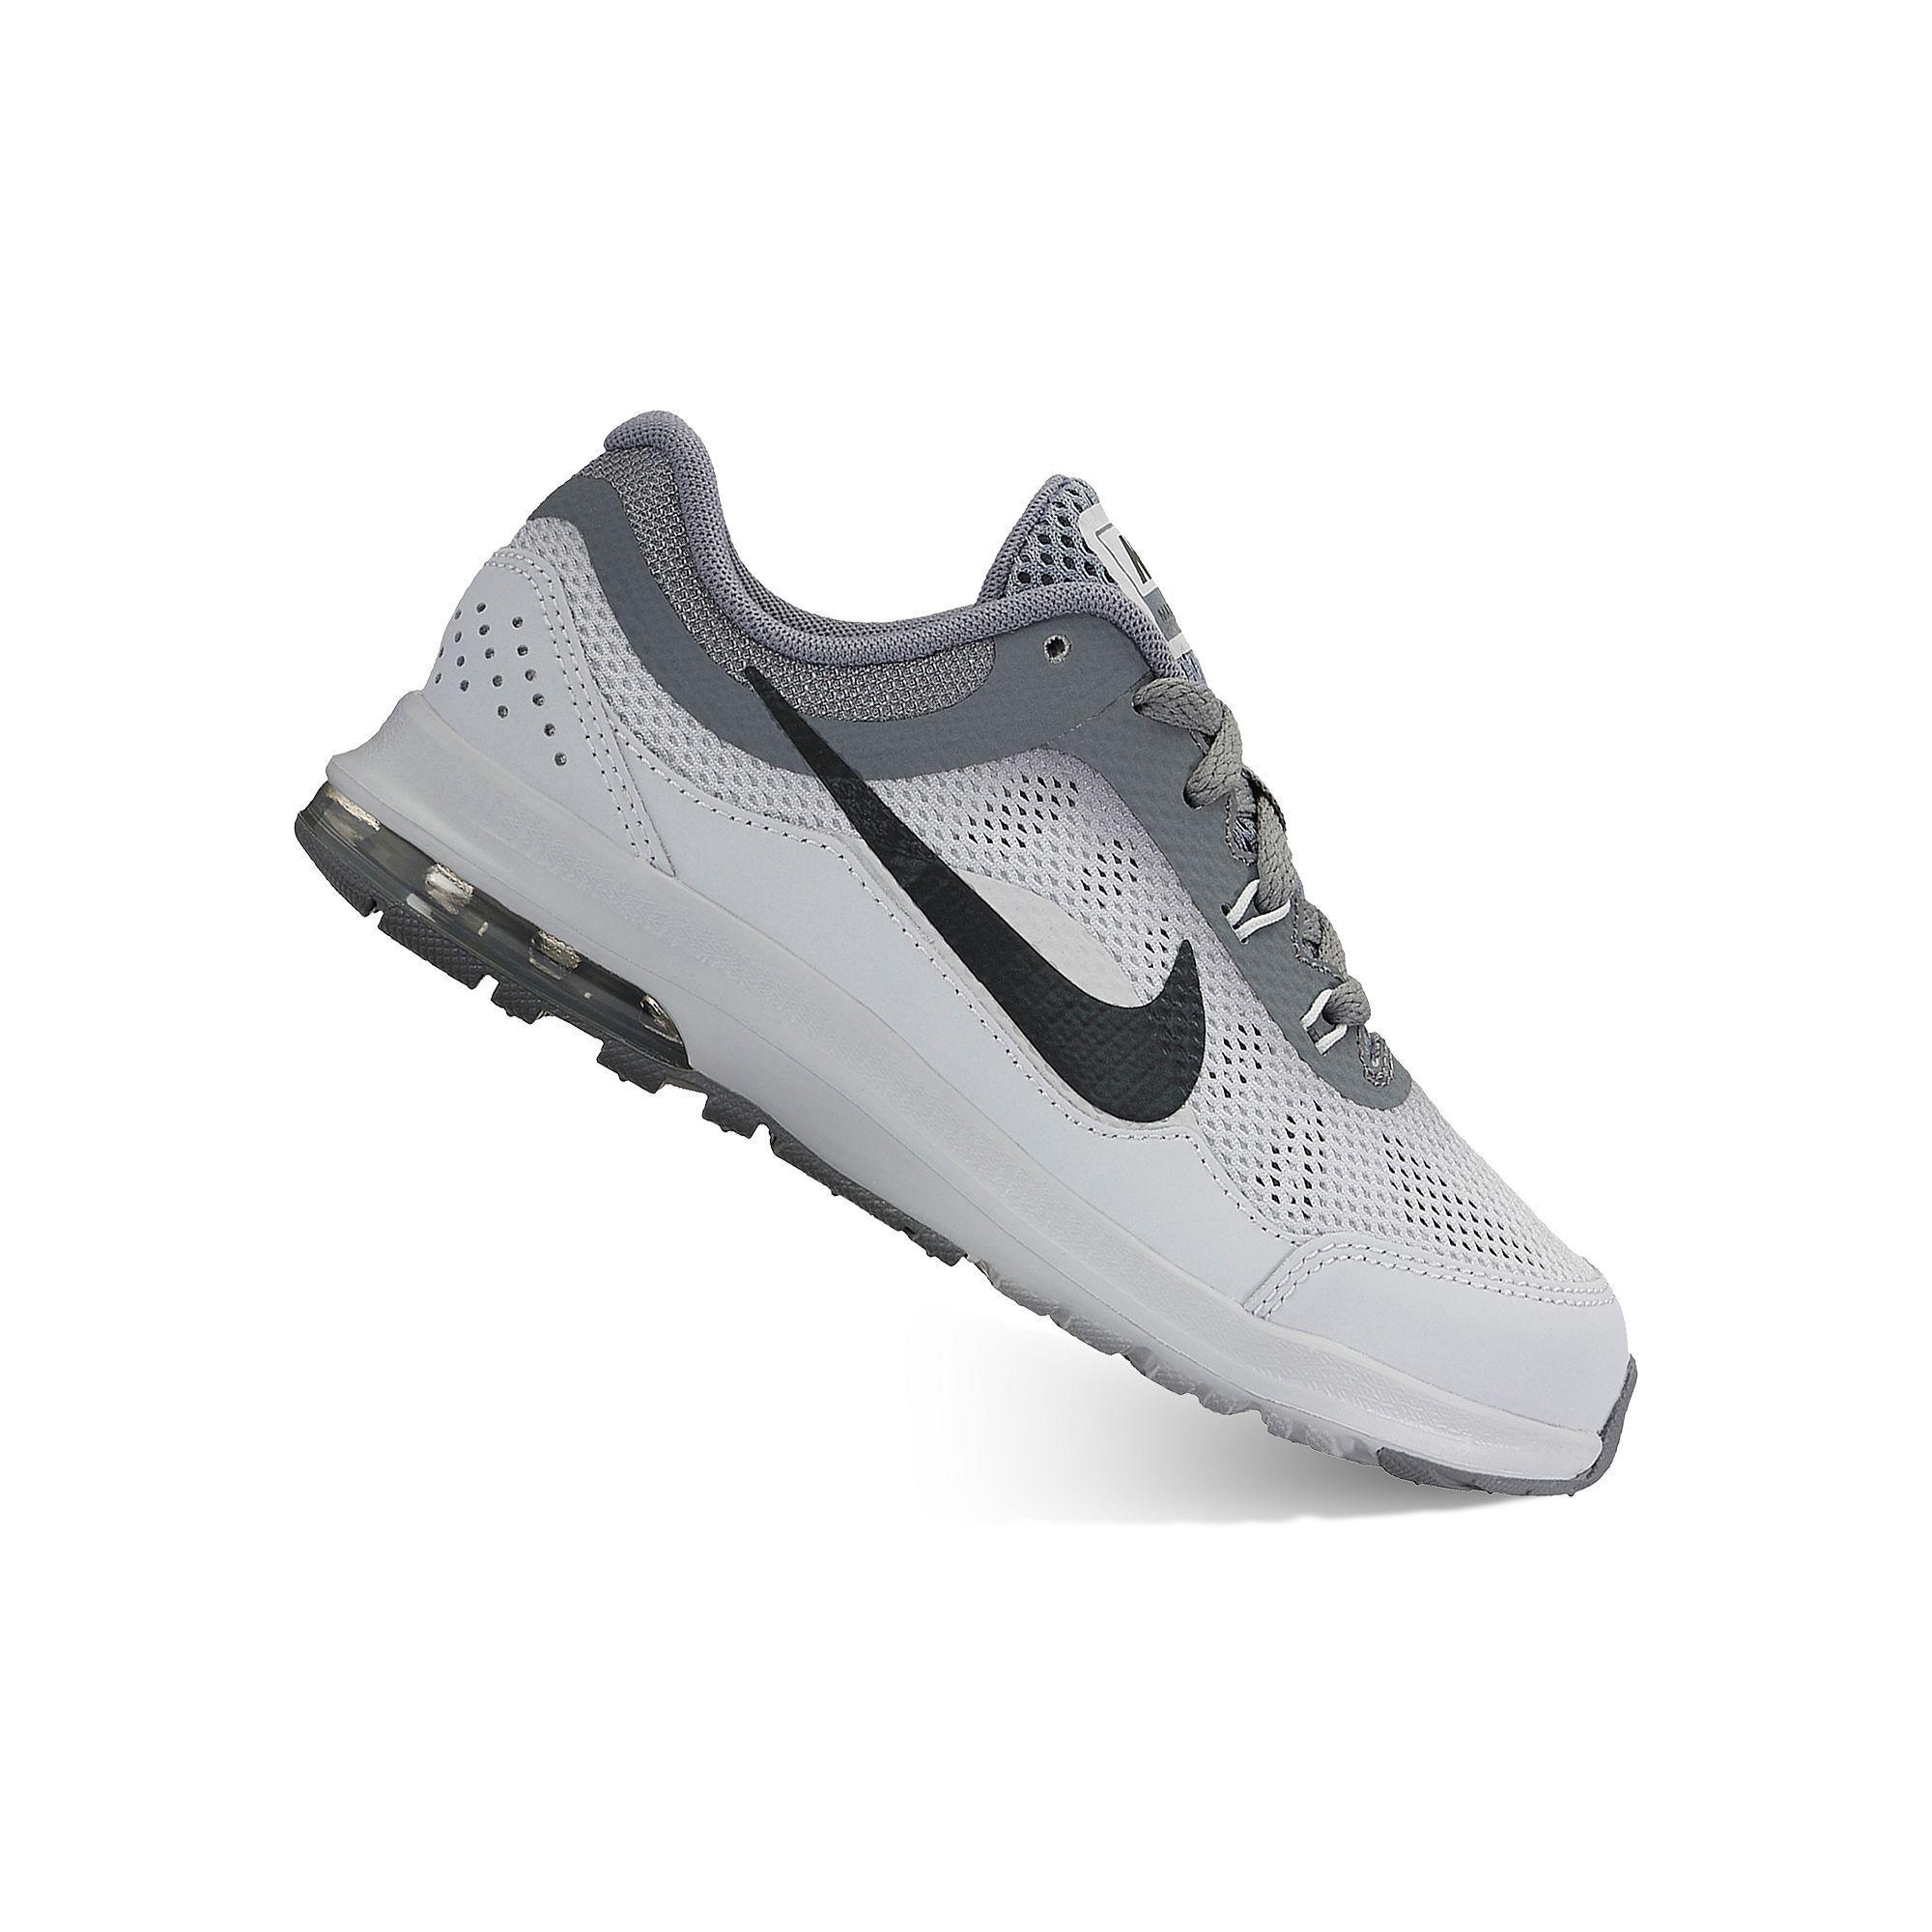 94baac861ea6 Nike Air Jordan 12 Retro White Black Varsity Red Kid Shoes 153265 ...